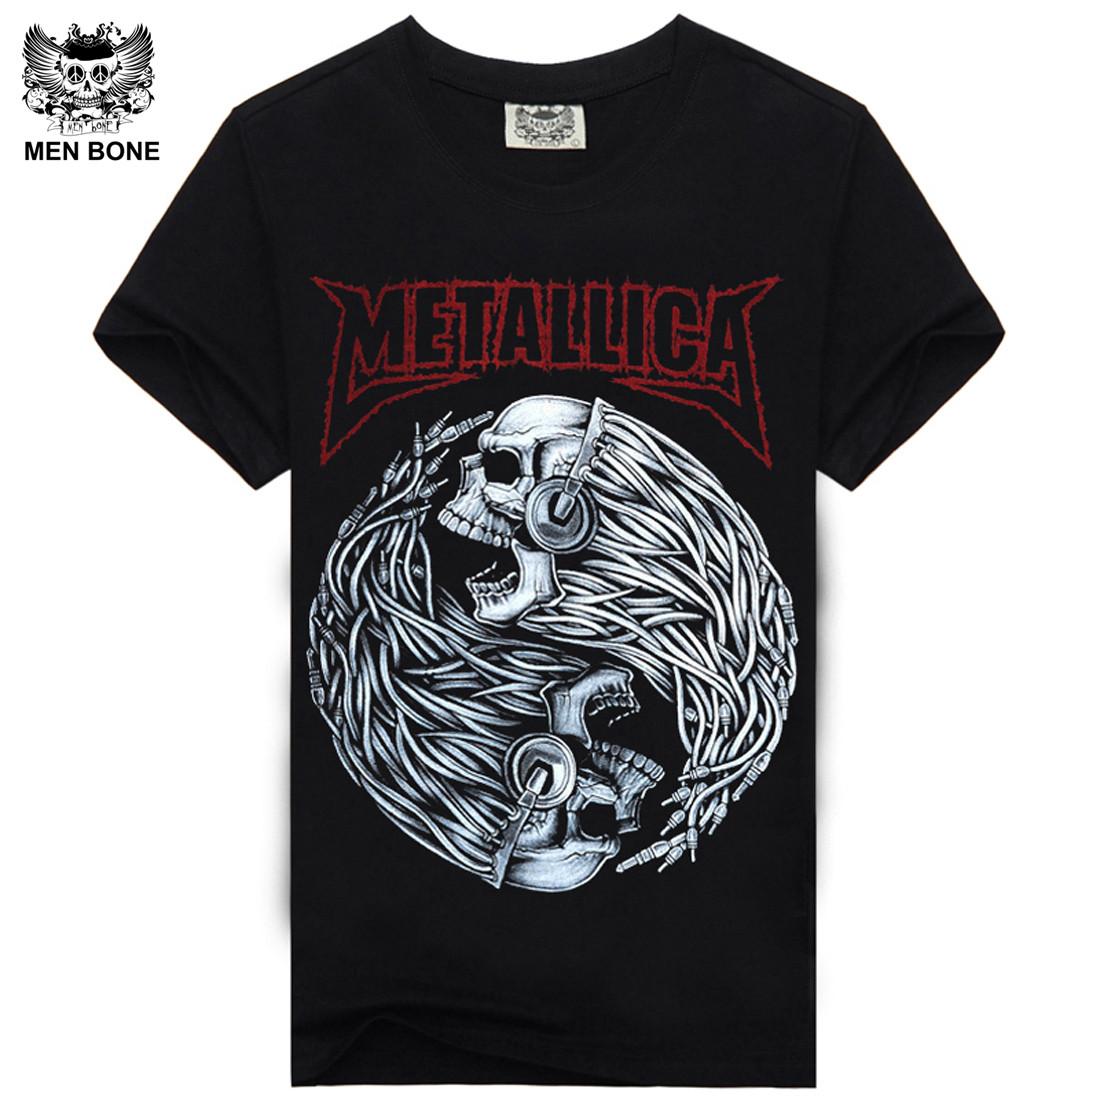 Men bone Tee Men T Shirt Black T-Shirt 100% Cotton Skull Print Heavy Metal Rock Hip Hop Clothing Black Metallica